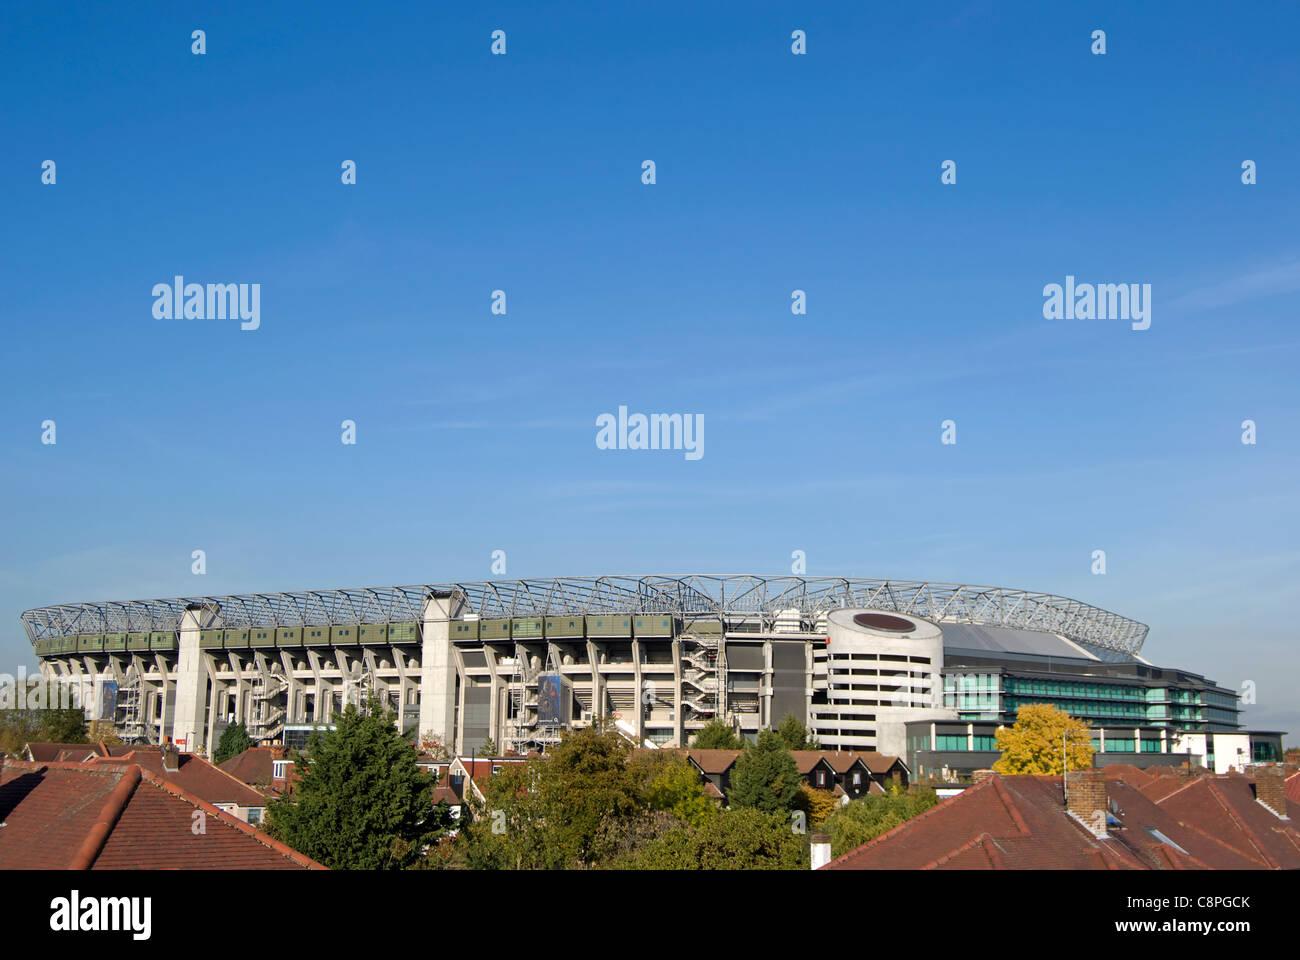 twickenham stadium, or rugby ground, twickenham, middlesex, england - Stock Image